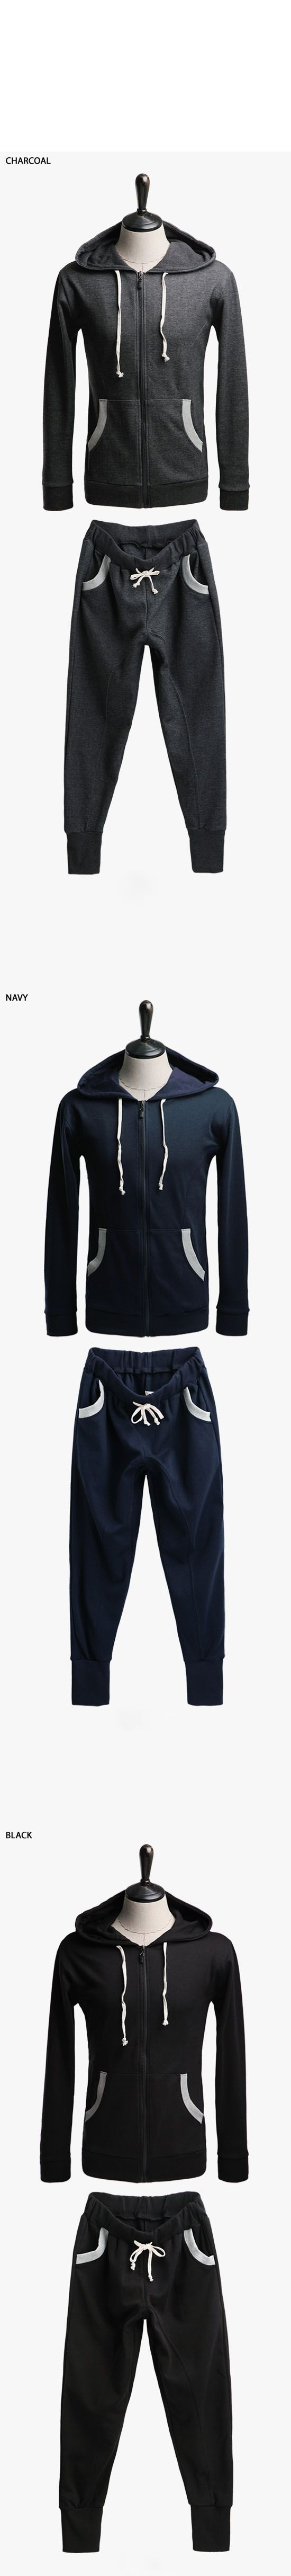 Gymwear Set :: 3/4 Baggy Workout Wear Set-Gymwear 01 - Mens Fashion Clothing For An Attractive Guy Look